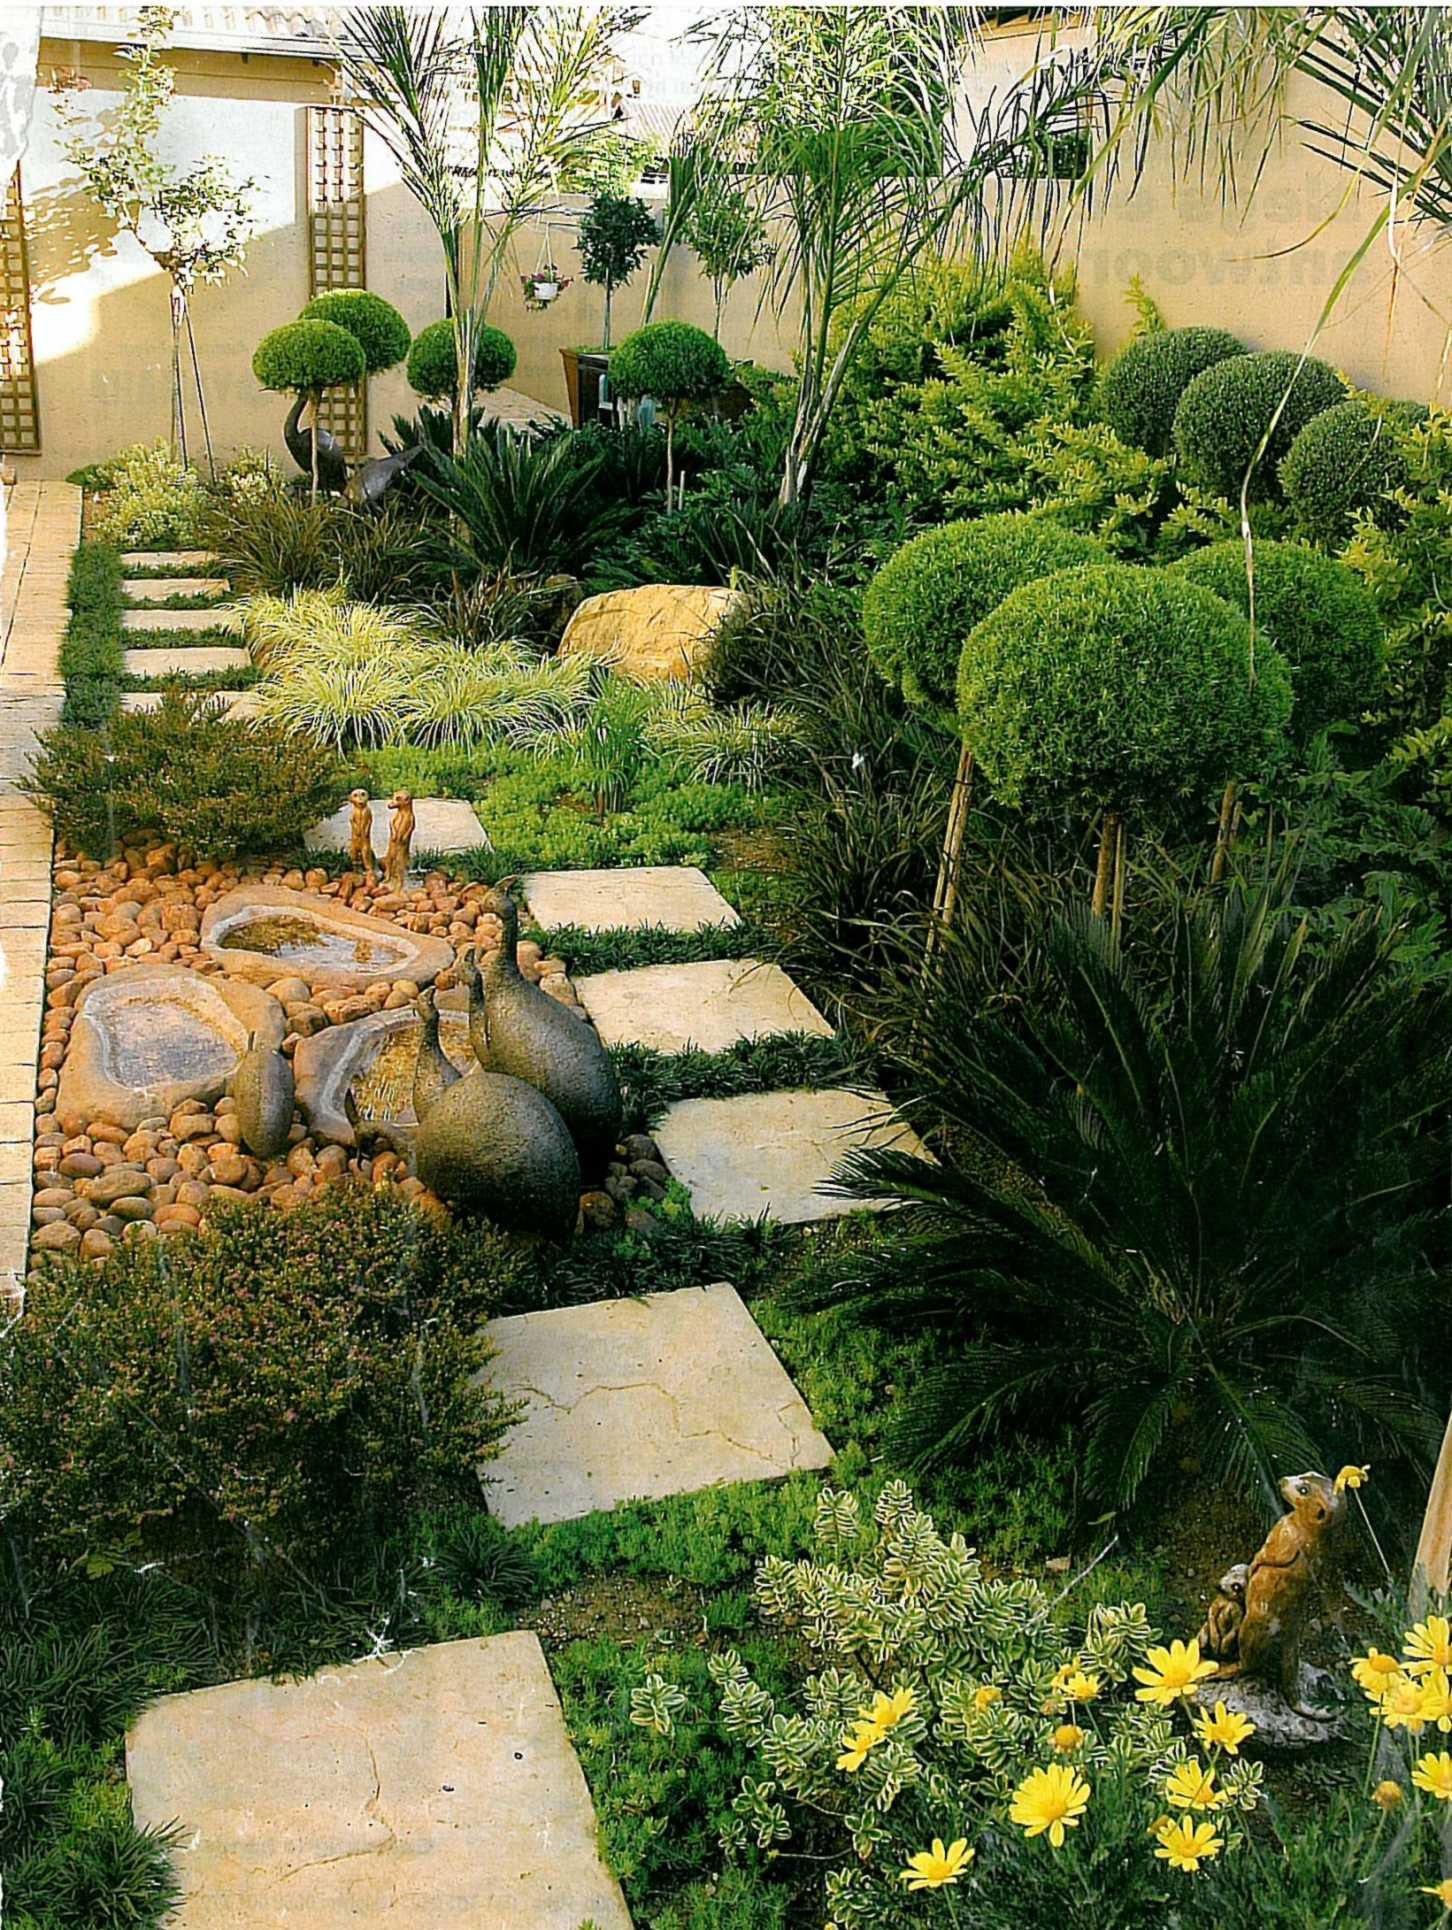 Waterwise Garden Theatre At Grand Designs Live 2016 Waterwise Garden Urban Garden Low Maintenance Garden